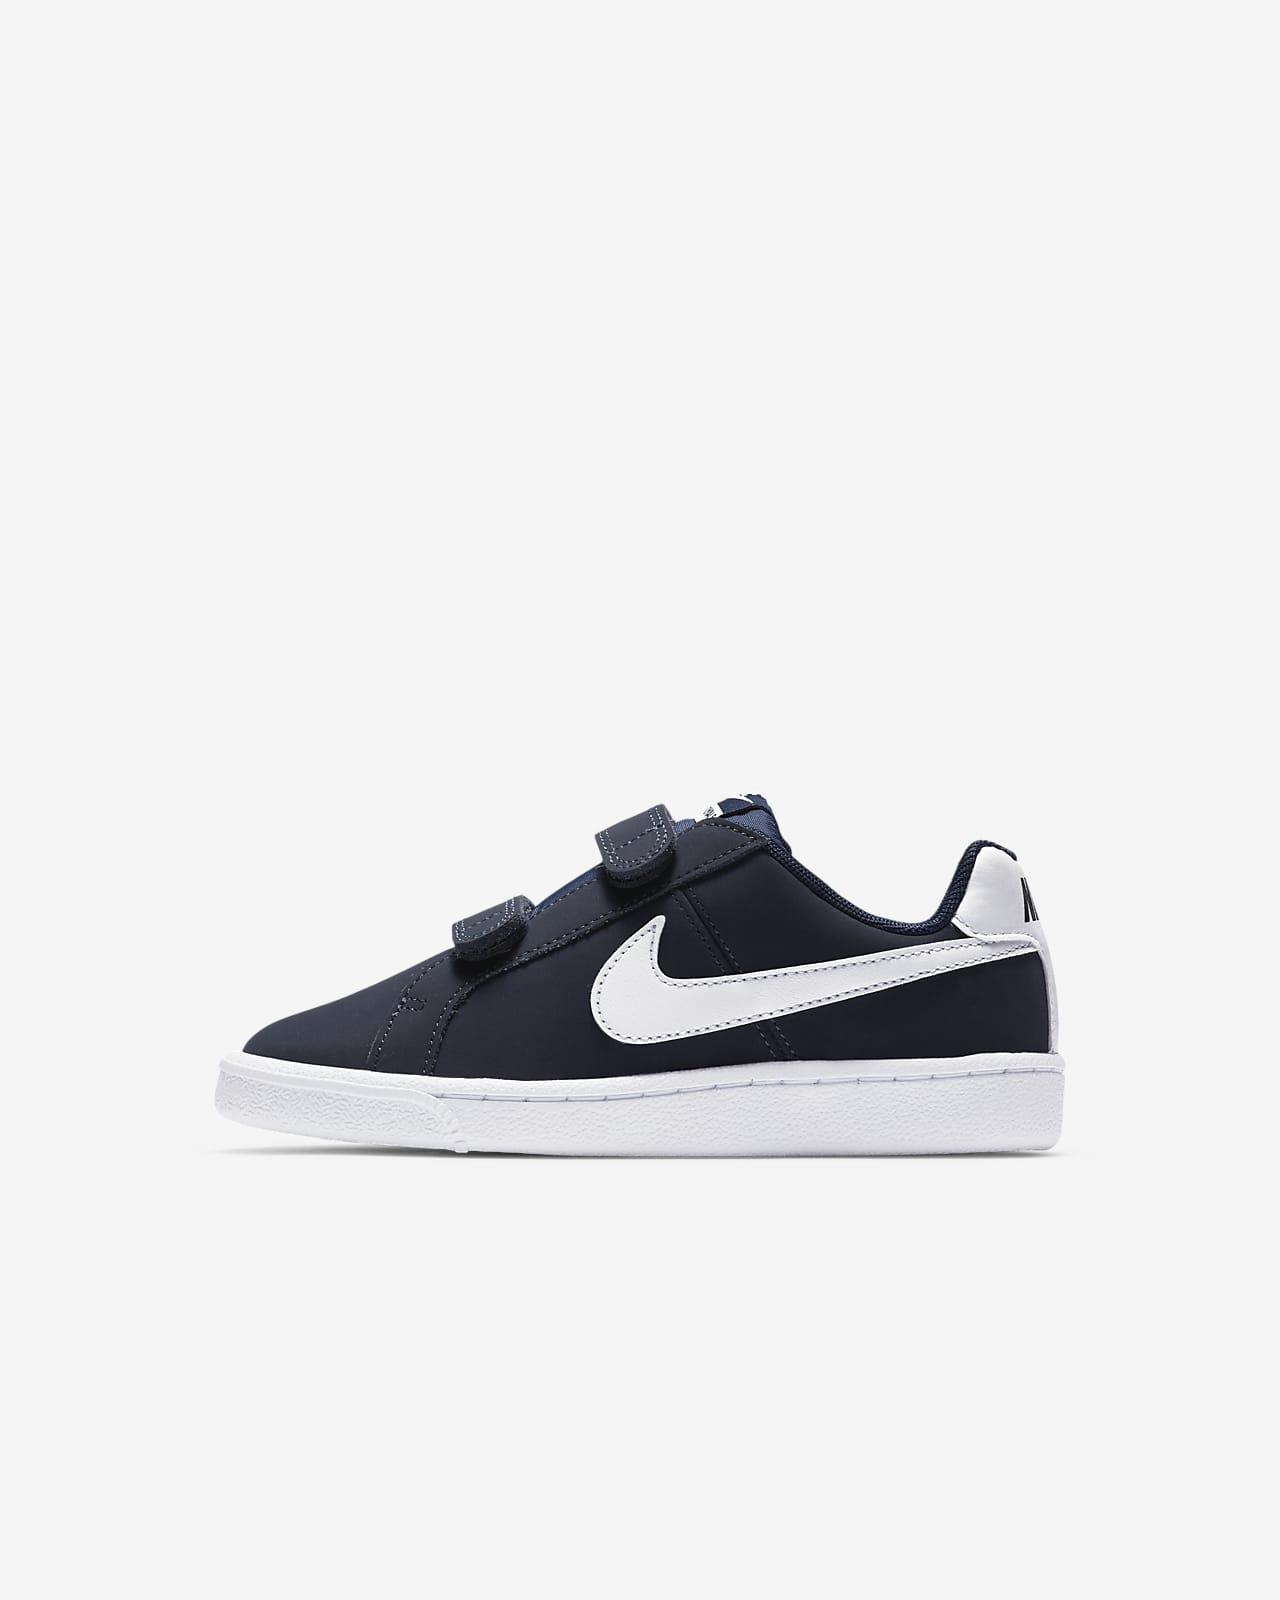 Sko Nike Court Royale för barn (killar)